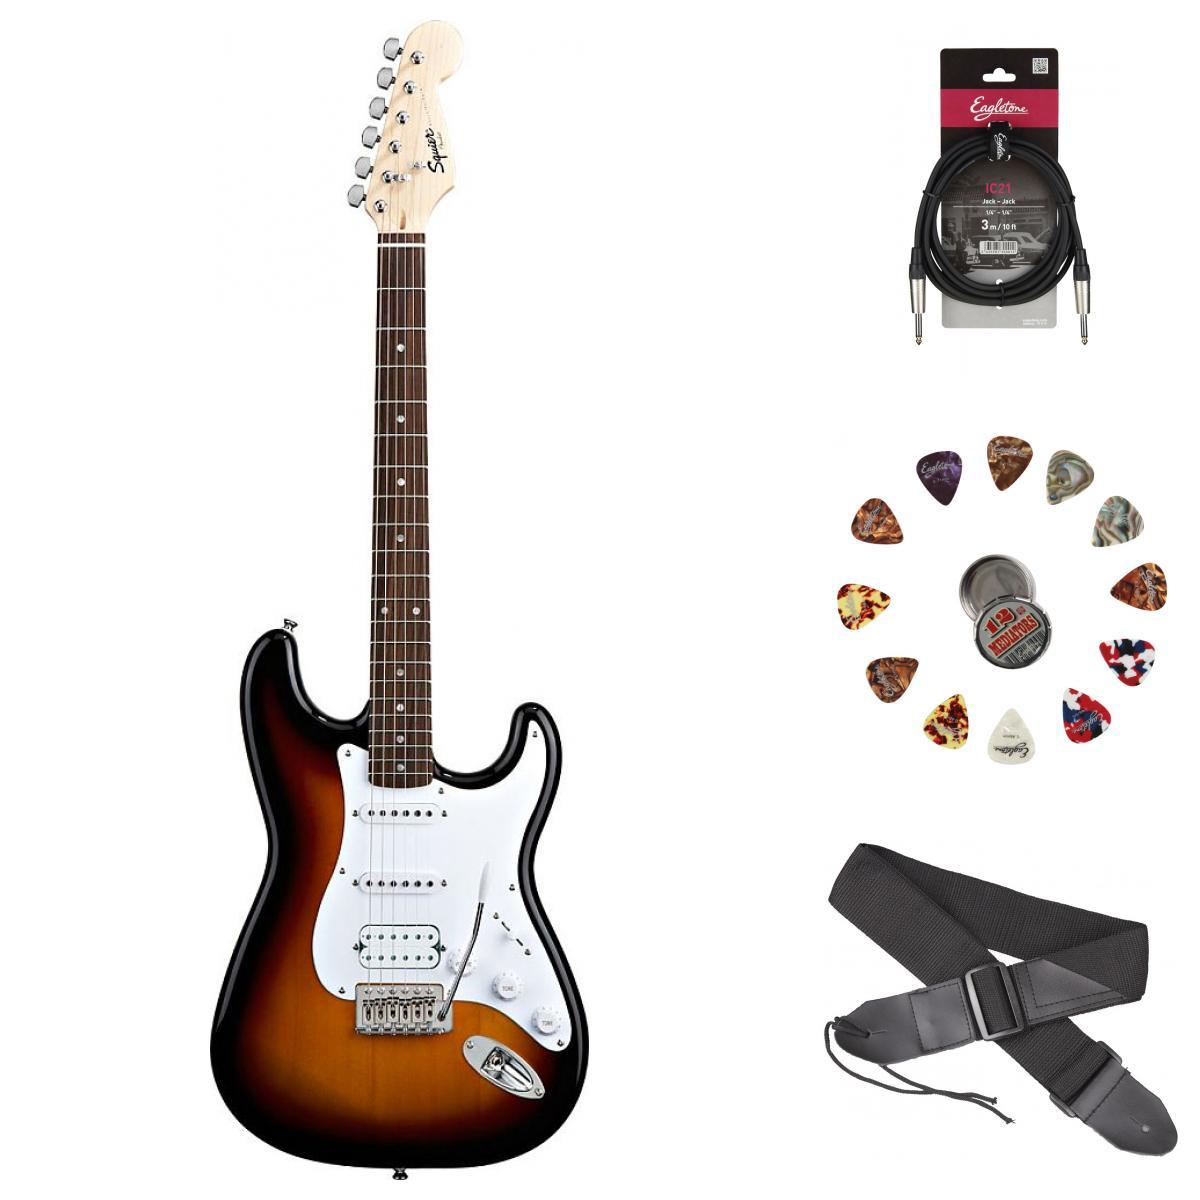 Squier By Fender Stratocaster Hss Brown Sunburst Bullet + Accessoires